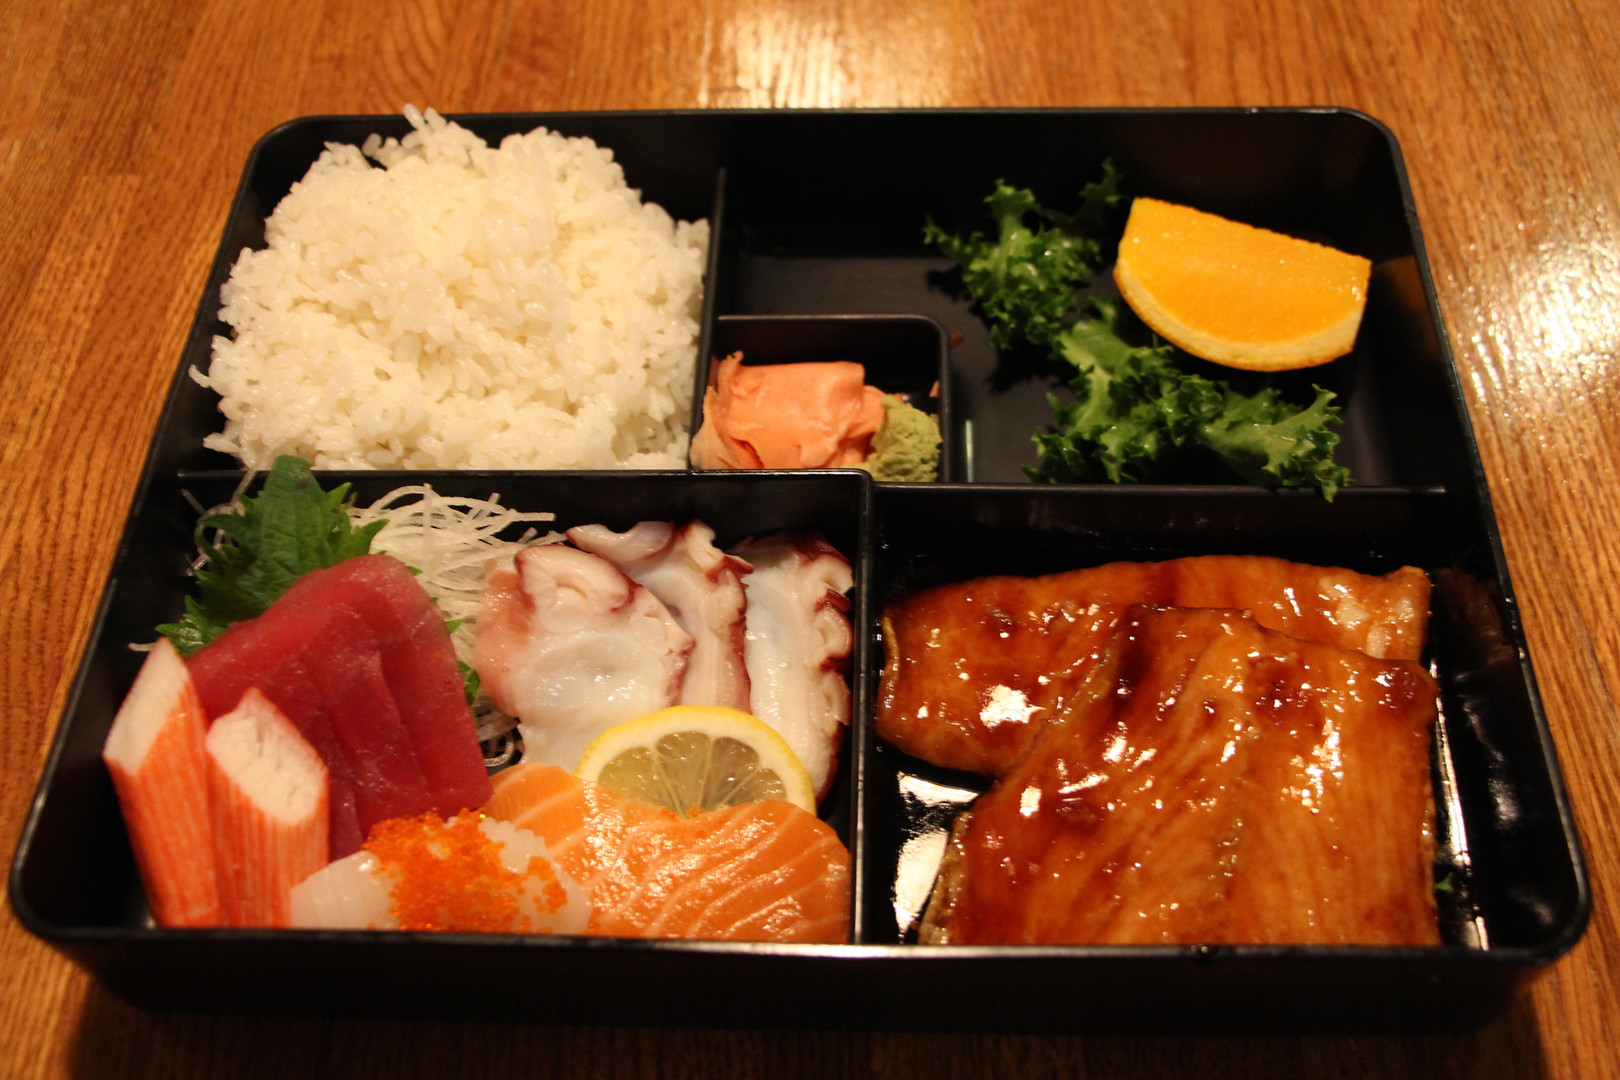 Sashimi & Salmon Teriyaki Bento Box